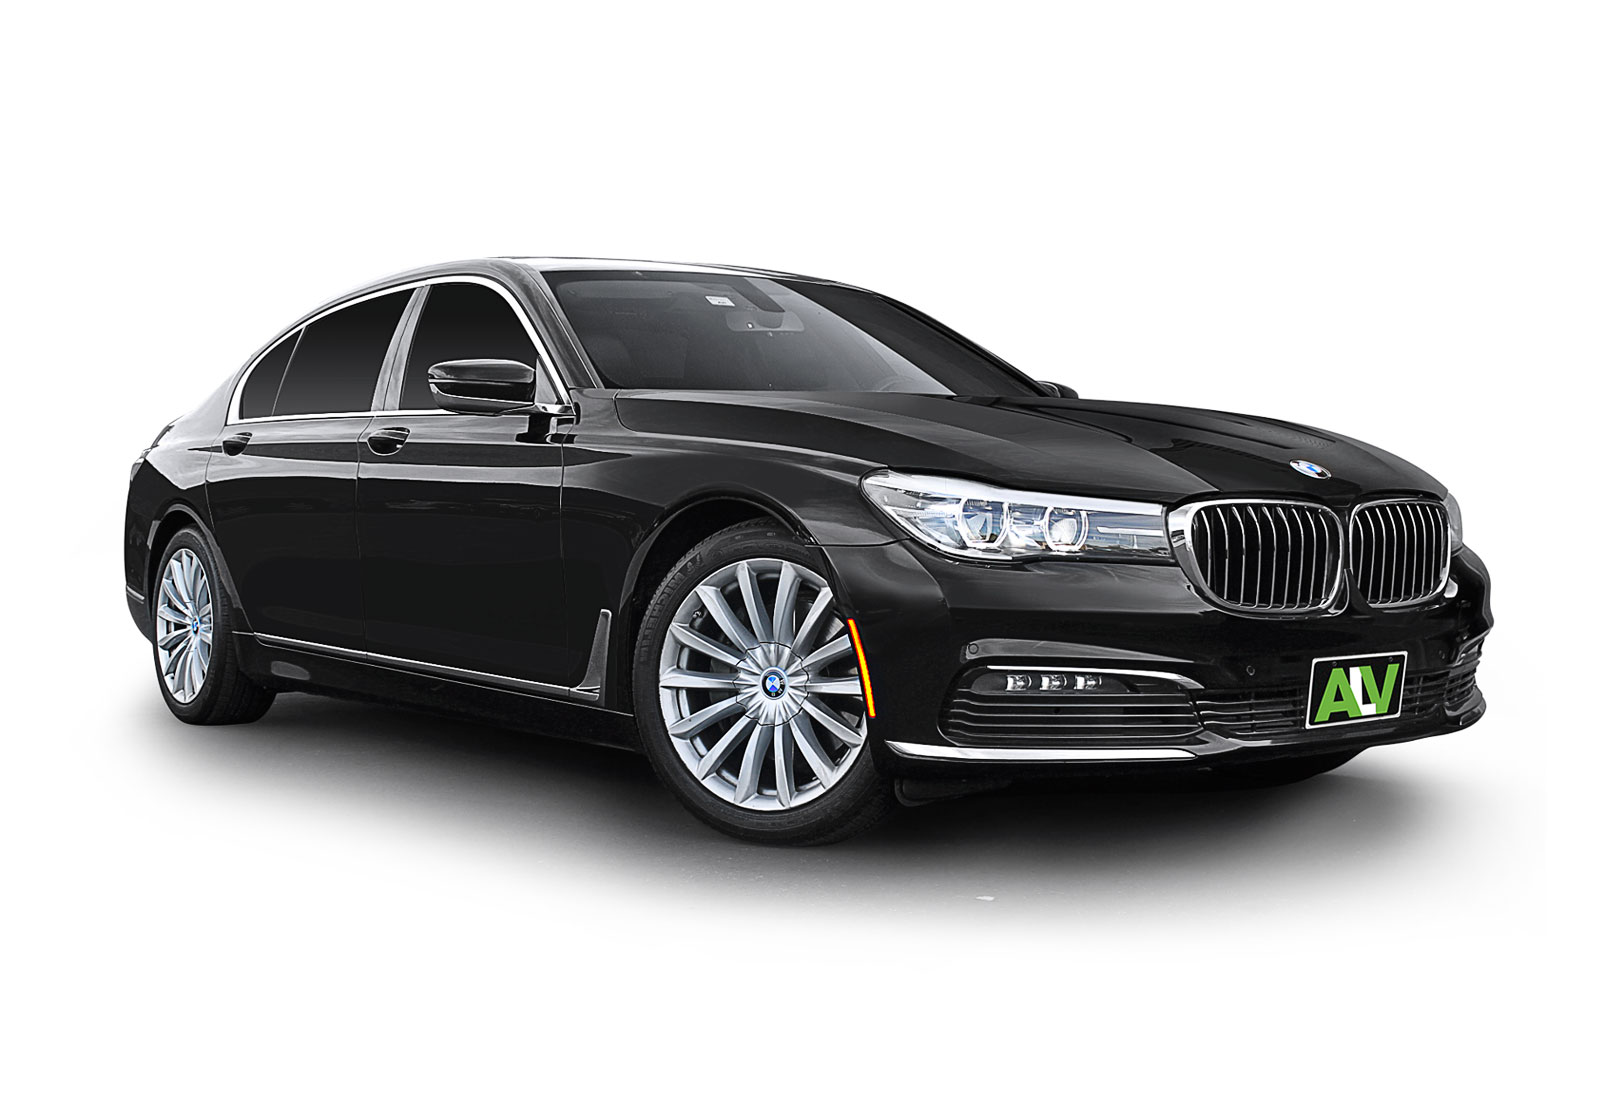 ALV Sedan BMW 750 I